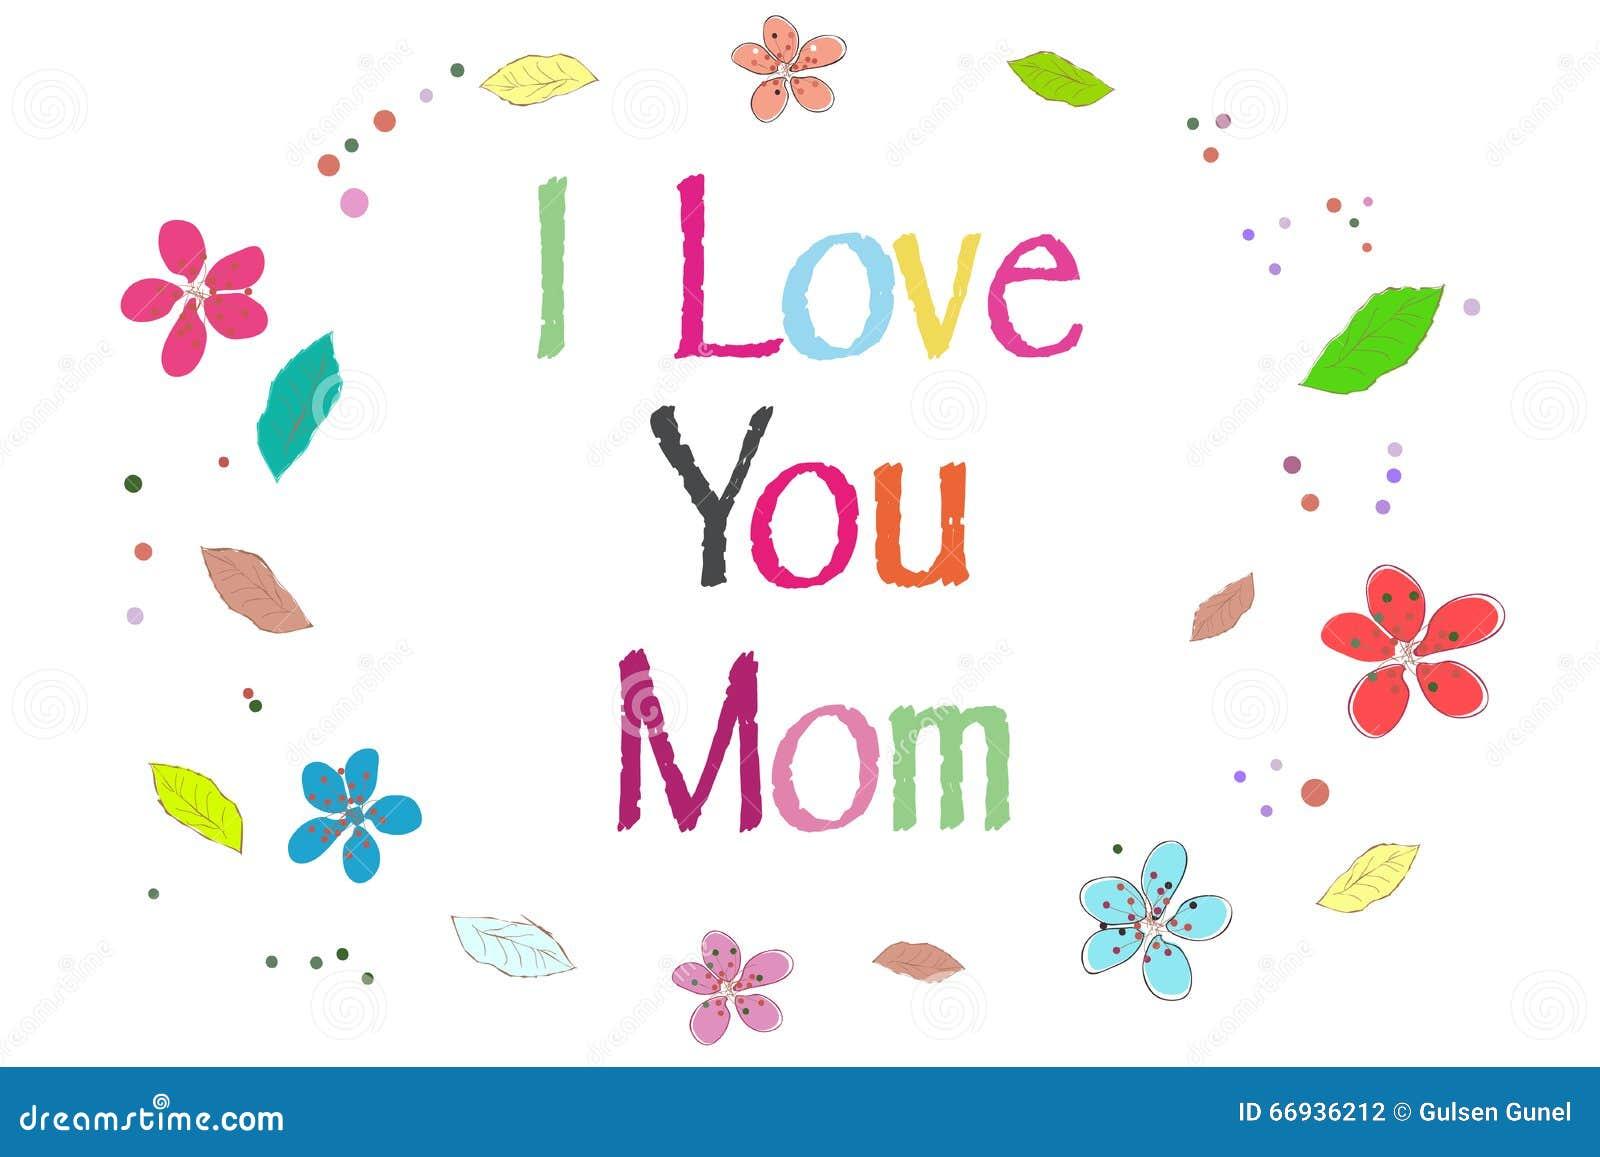 Я люблю тебя мама : картинка и фото я тебя люблю маму, скачать рисунки 30